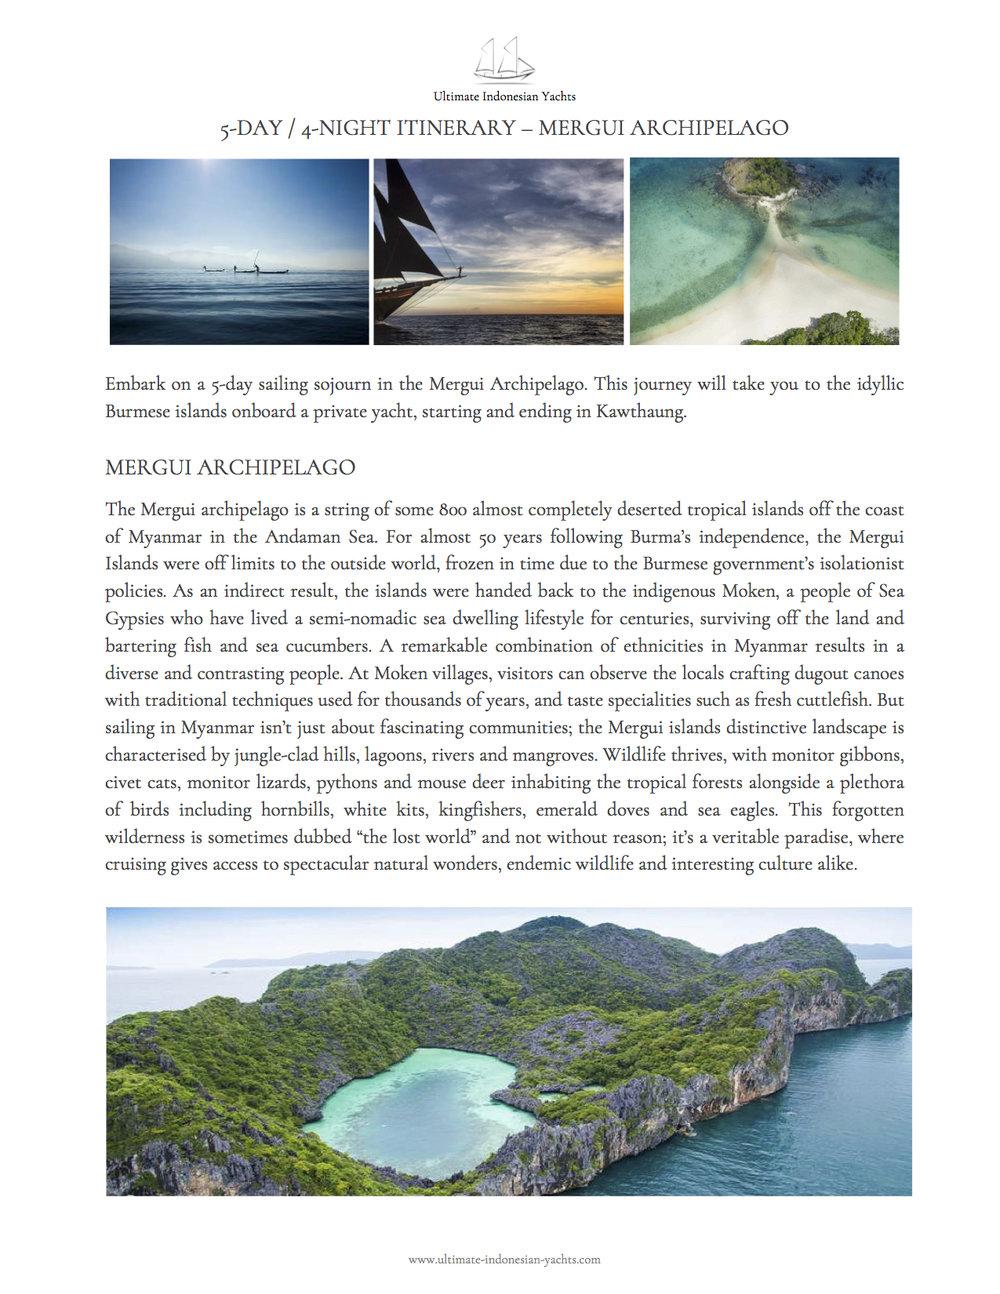 UIY Itinerary - 5 Day Mergui Archipelago_2017.jpg